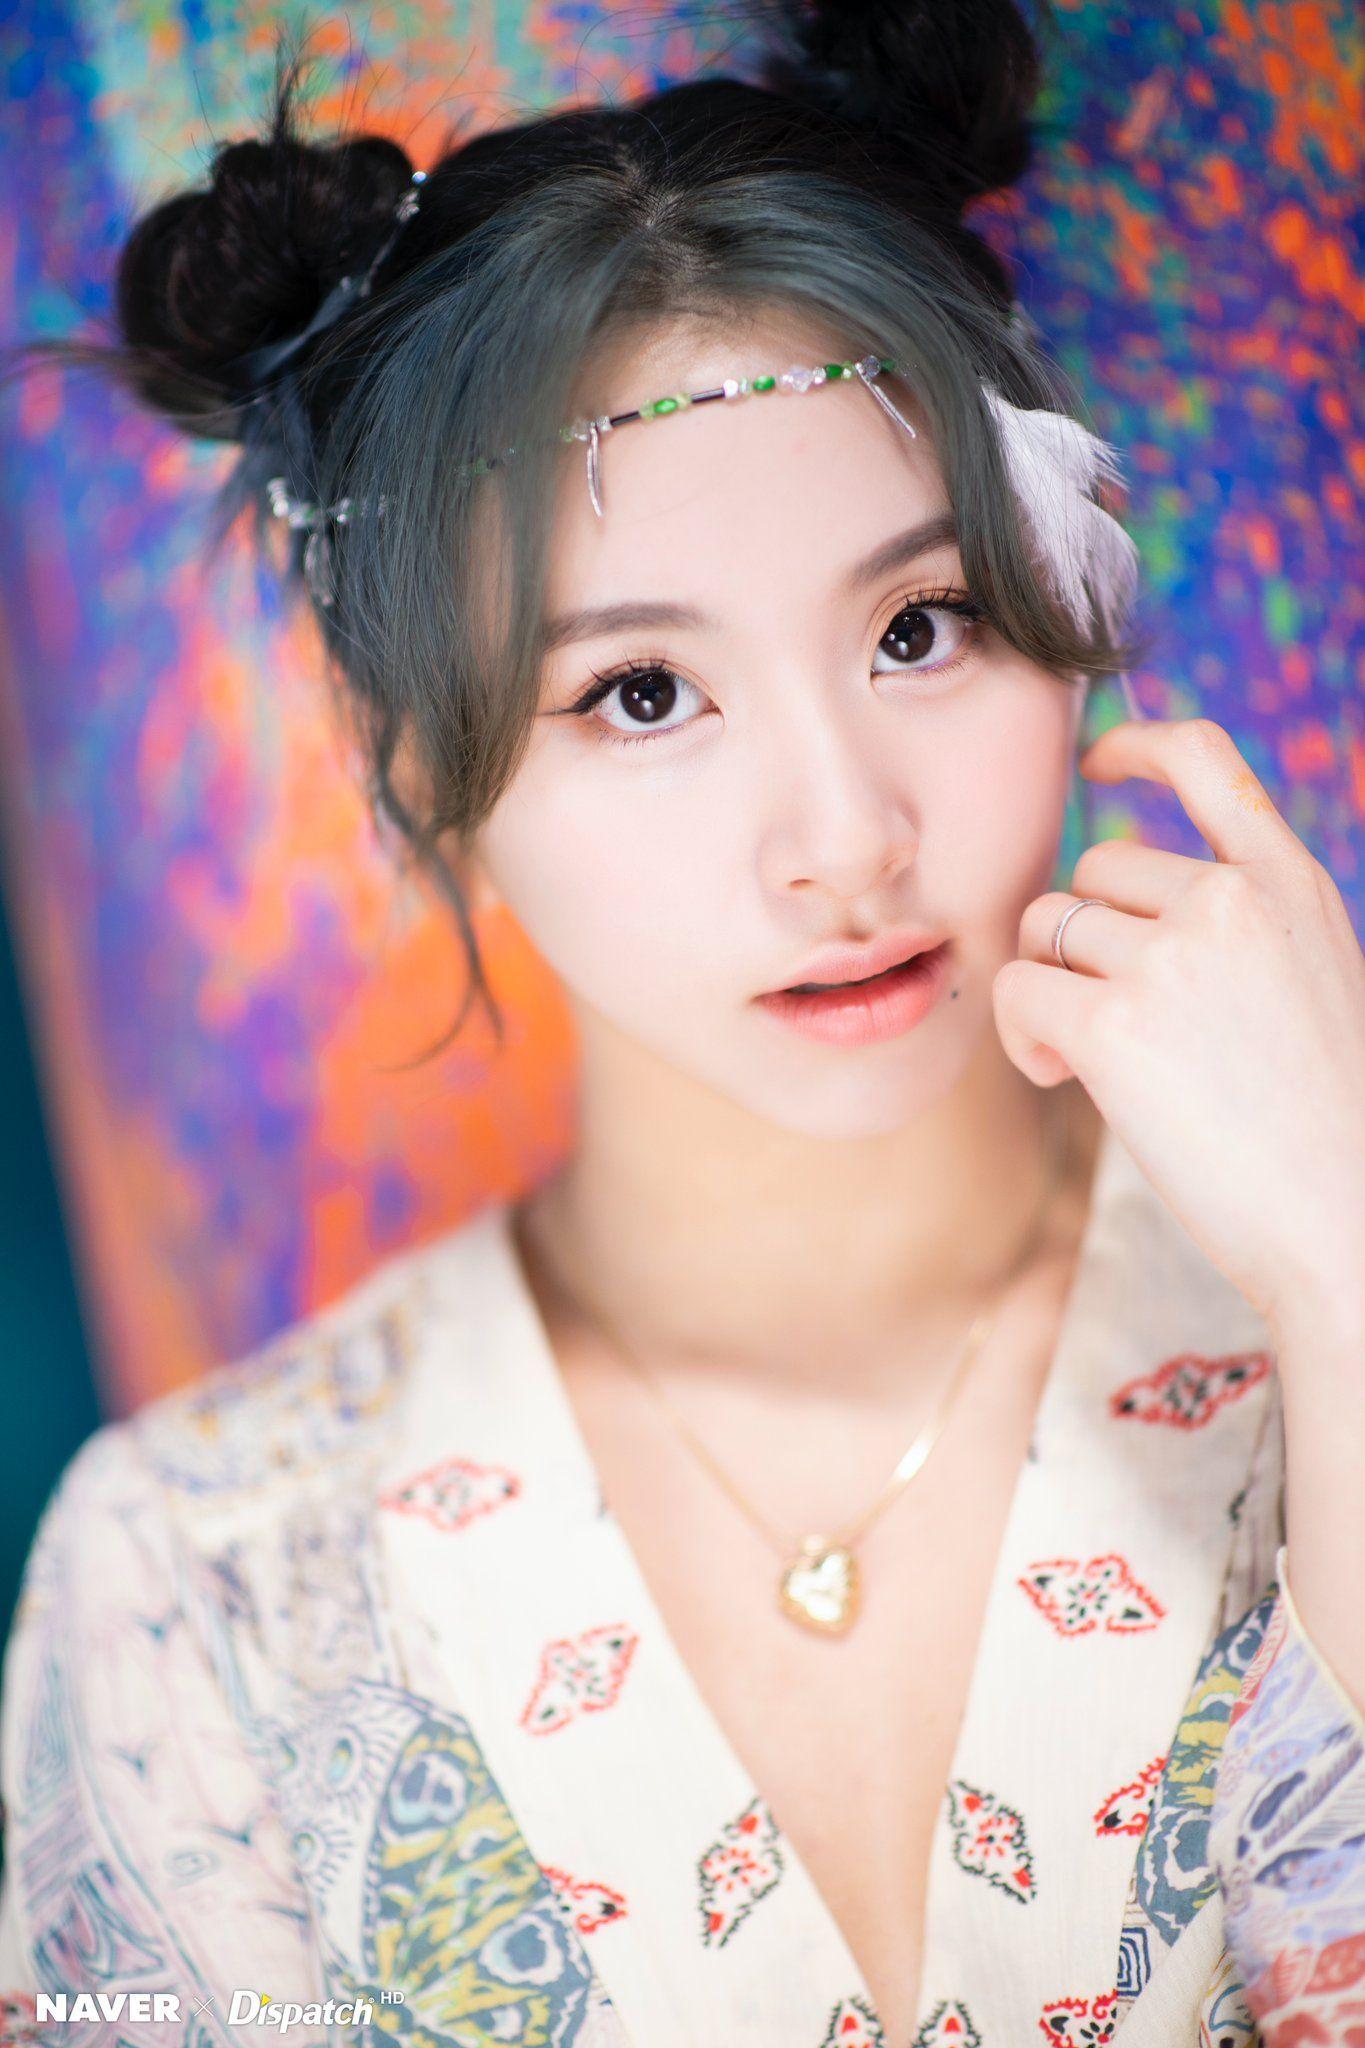 misa •ᴗ• on Twitter in 2020 Mini albums, Twice, Kpop